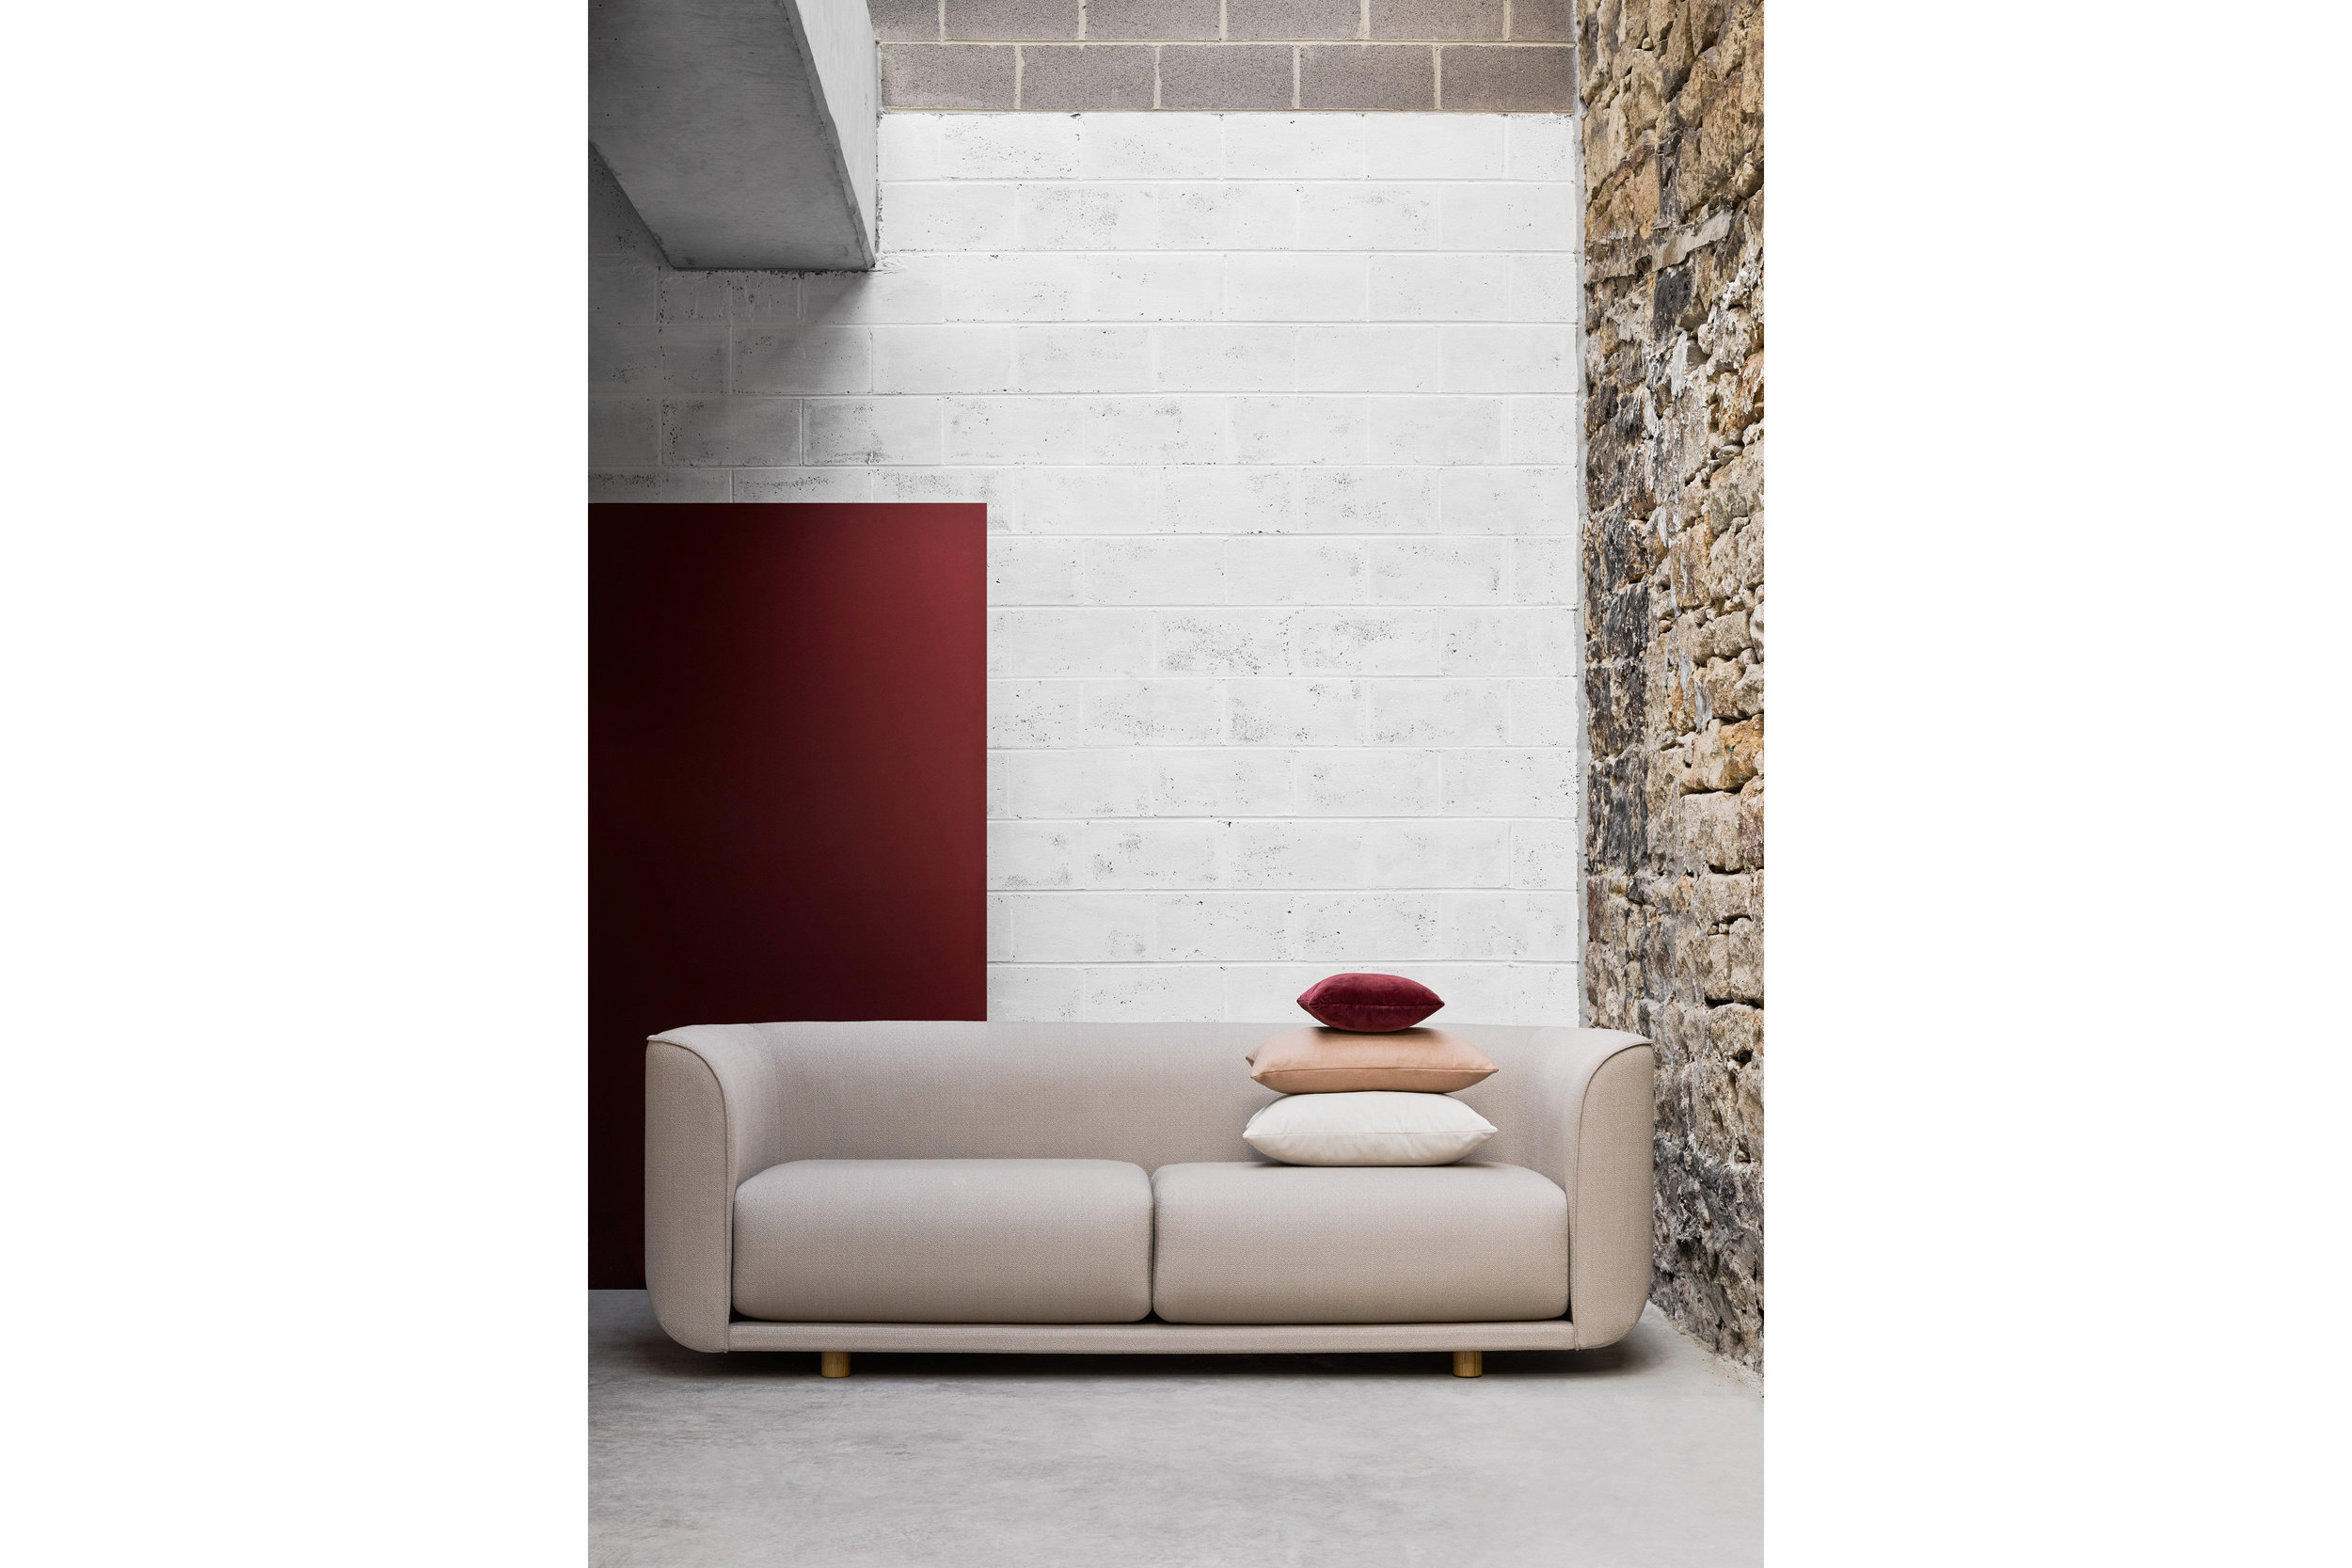 nau-new-australian-design-furniture_dezeen_2364_col_3.jpg